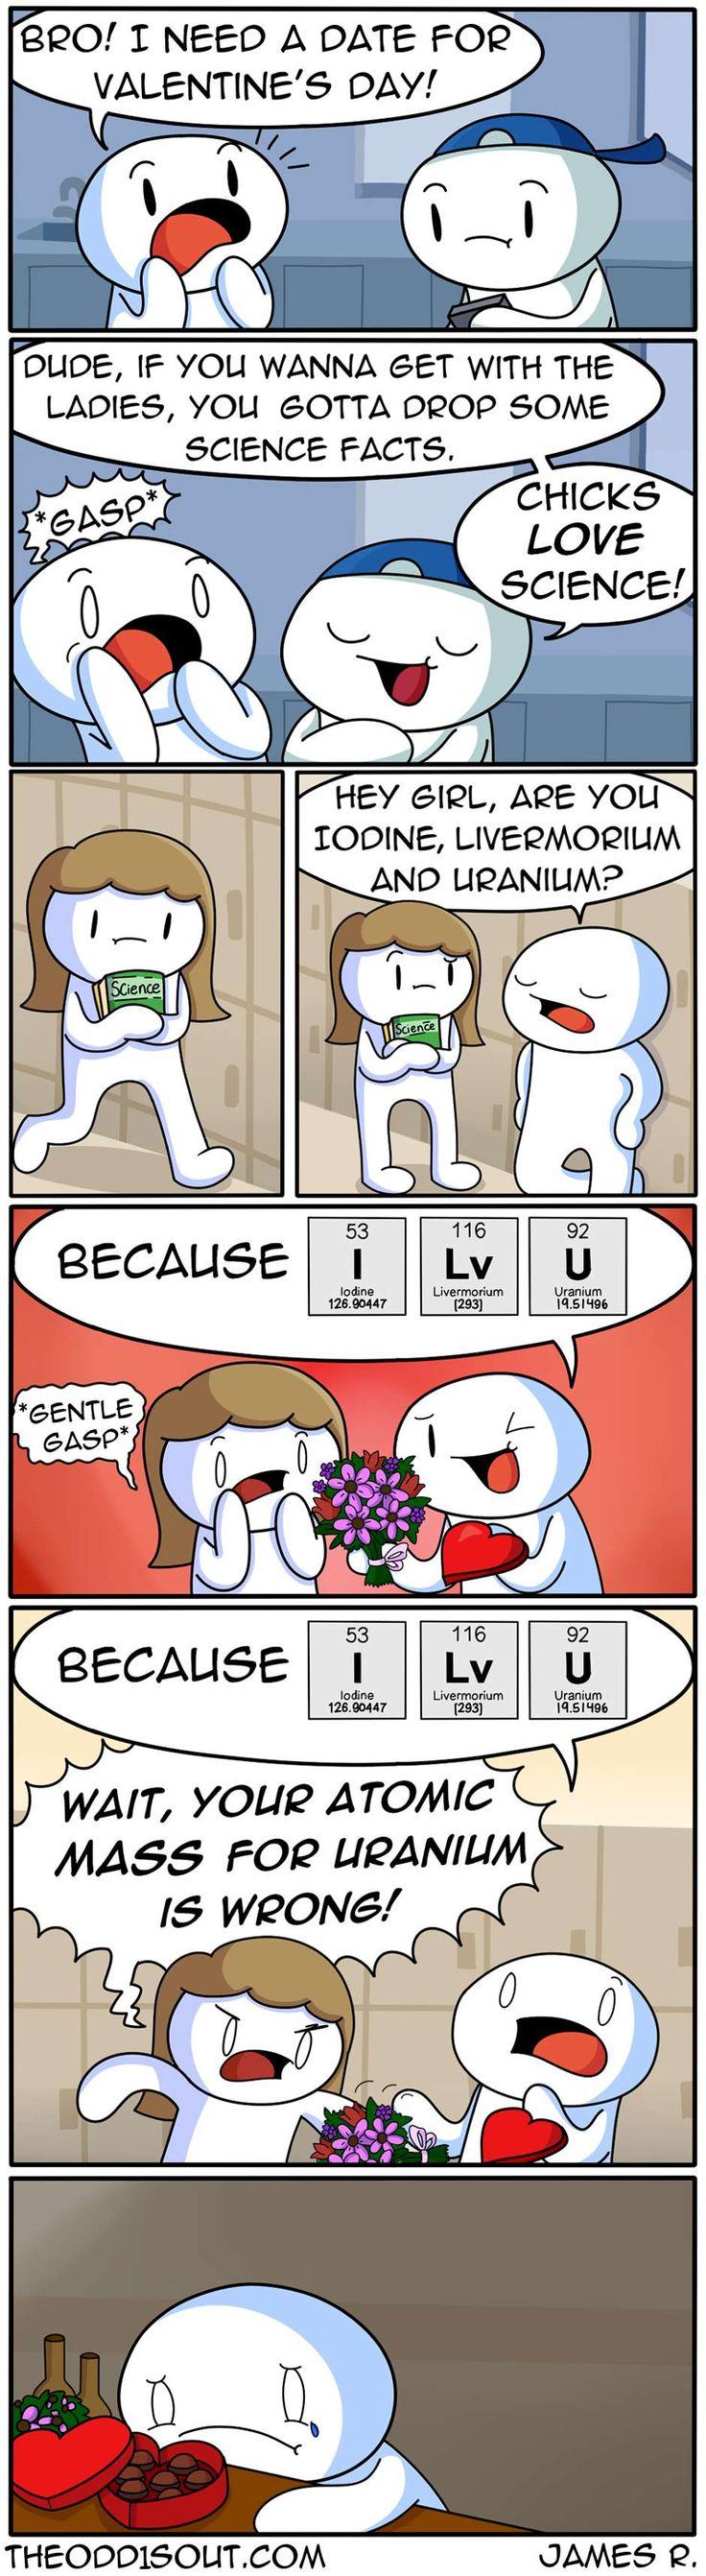 Theodd1sout :: Chicks Love Science!   Tapastic Comics - image 1